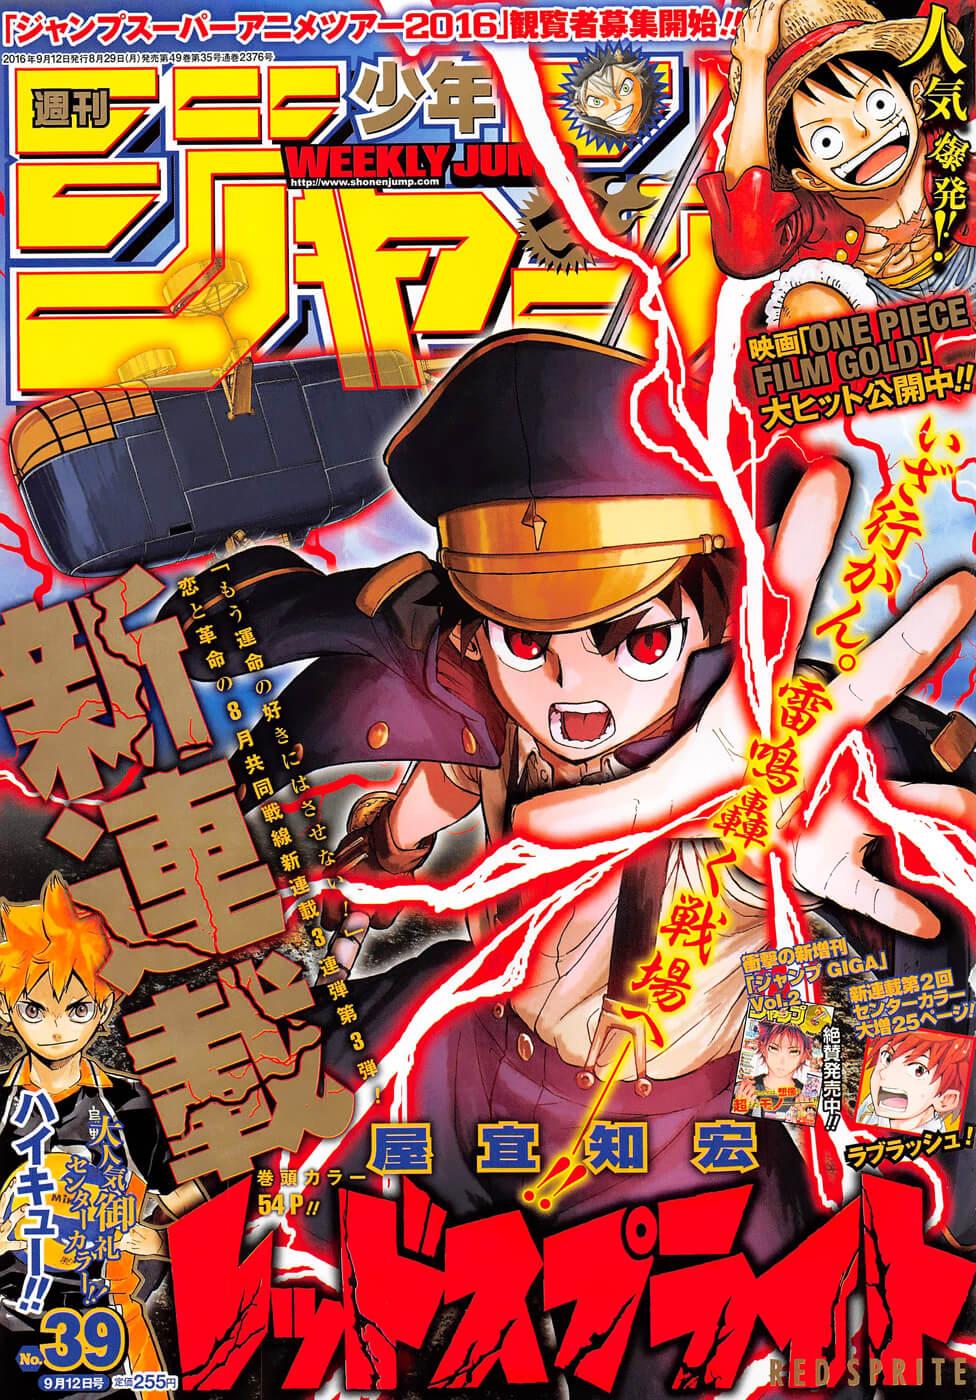 Shonen Jump Capa 39